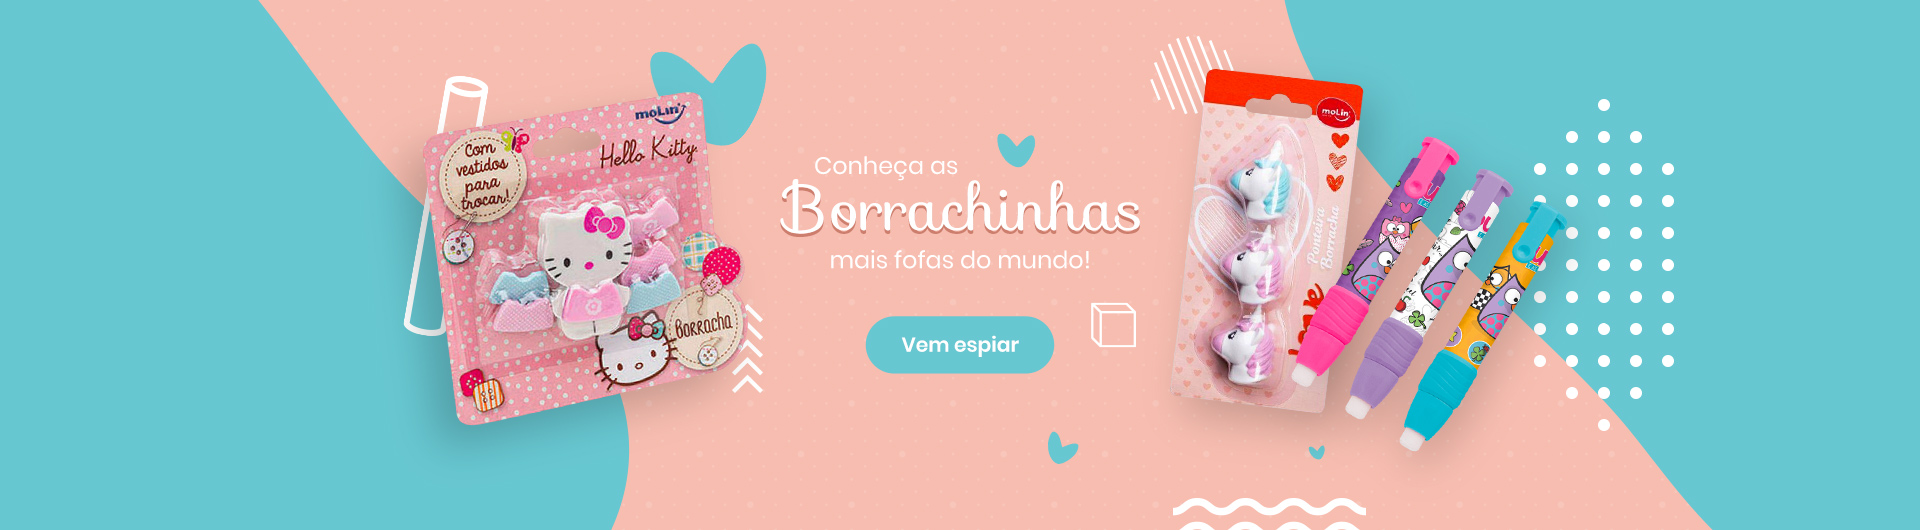 Borrachinhas